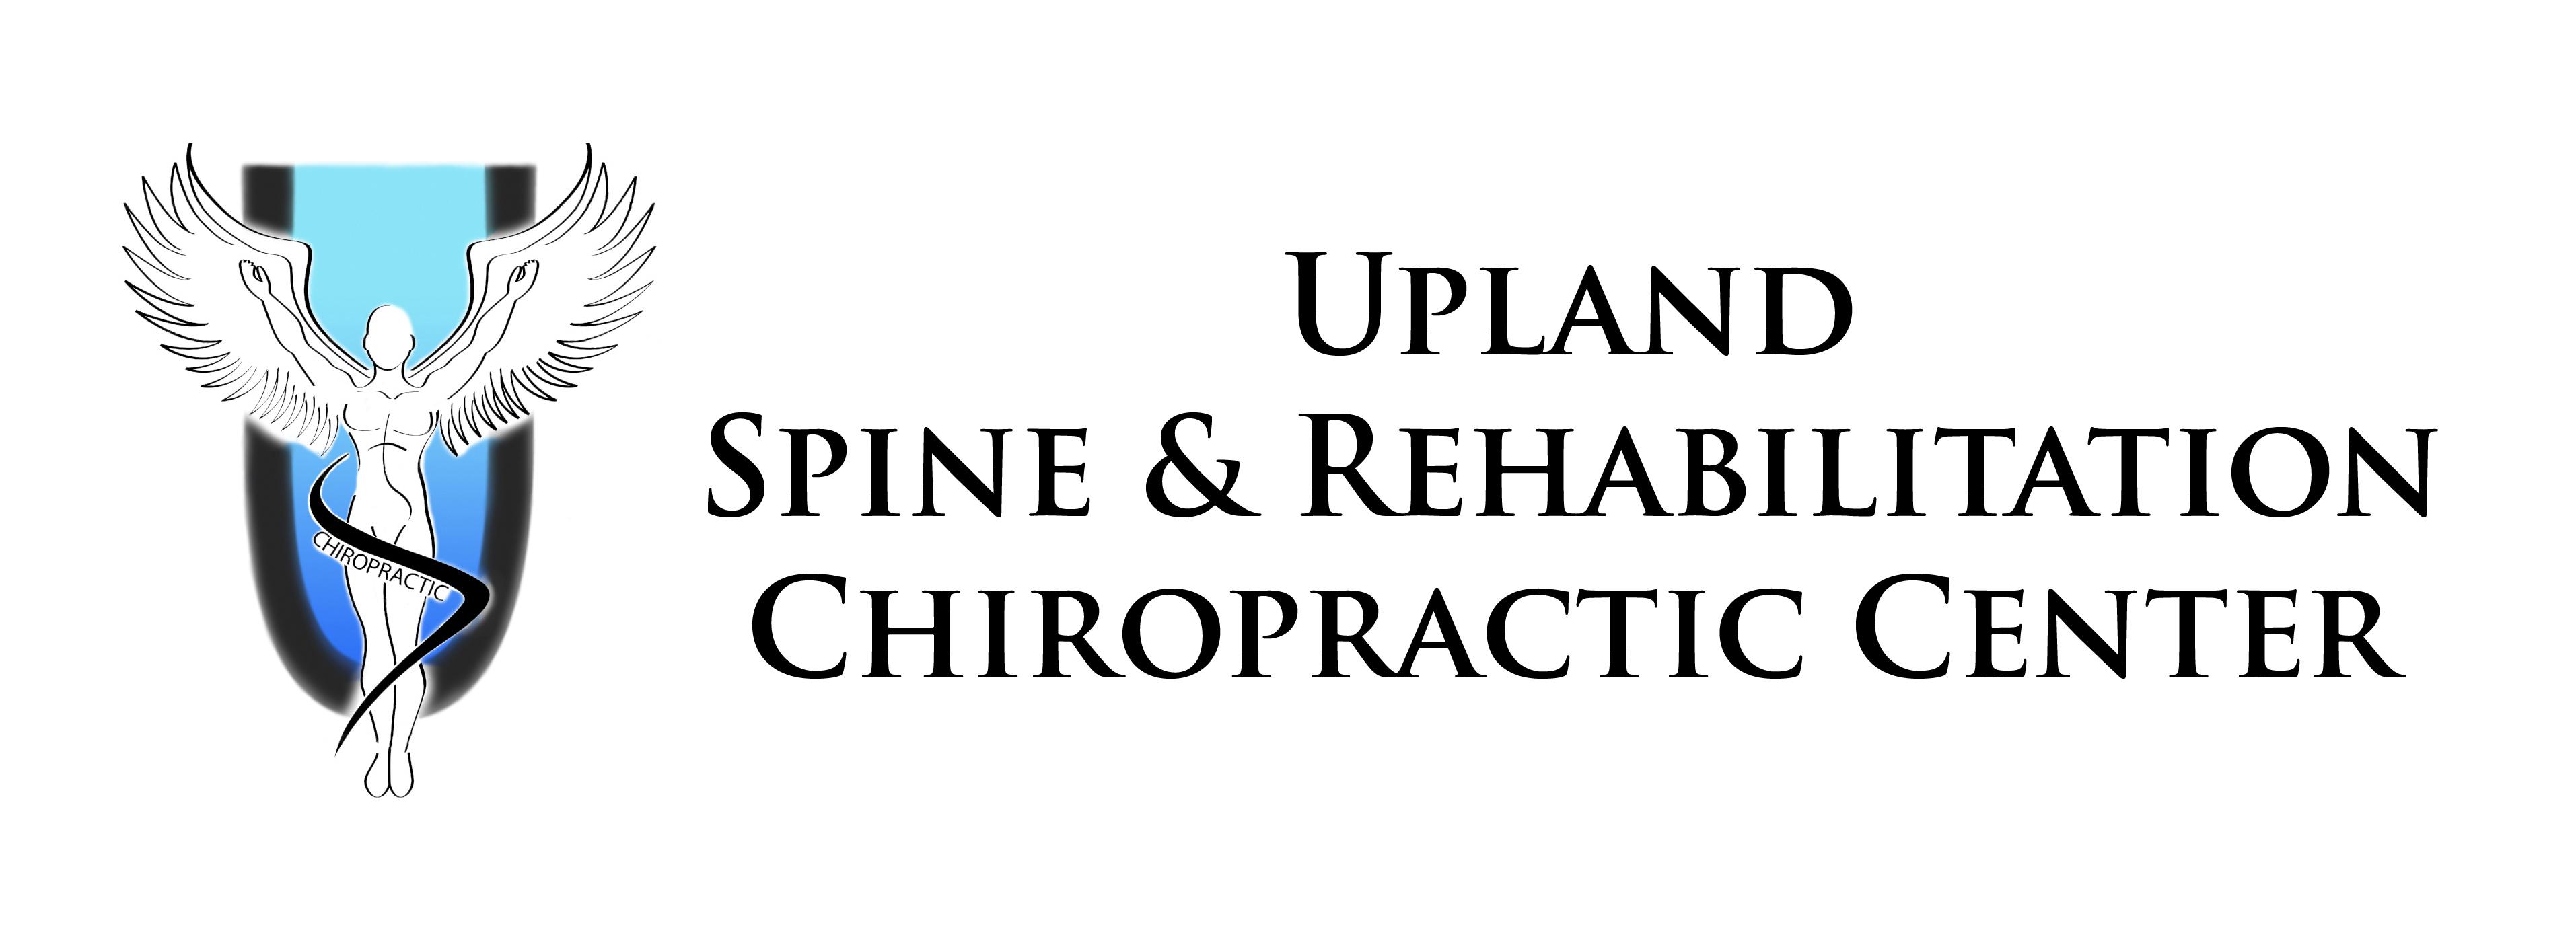 Upland Spine & Rehabilitation Chiropractic Center 1125 E